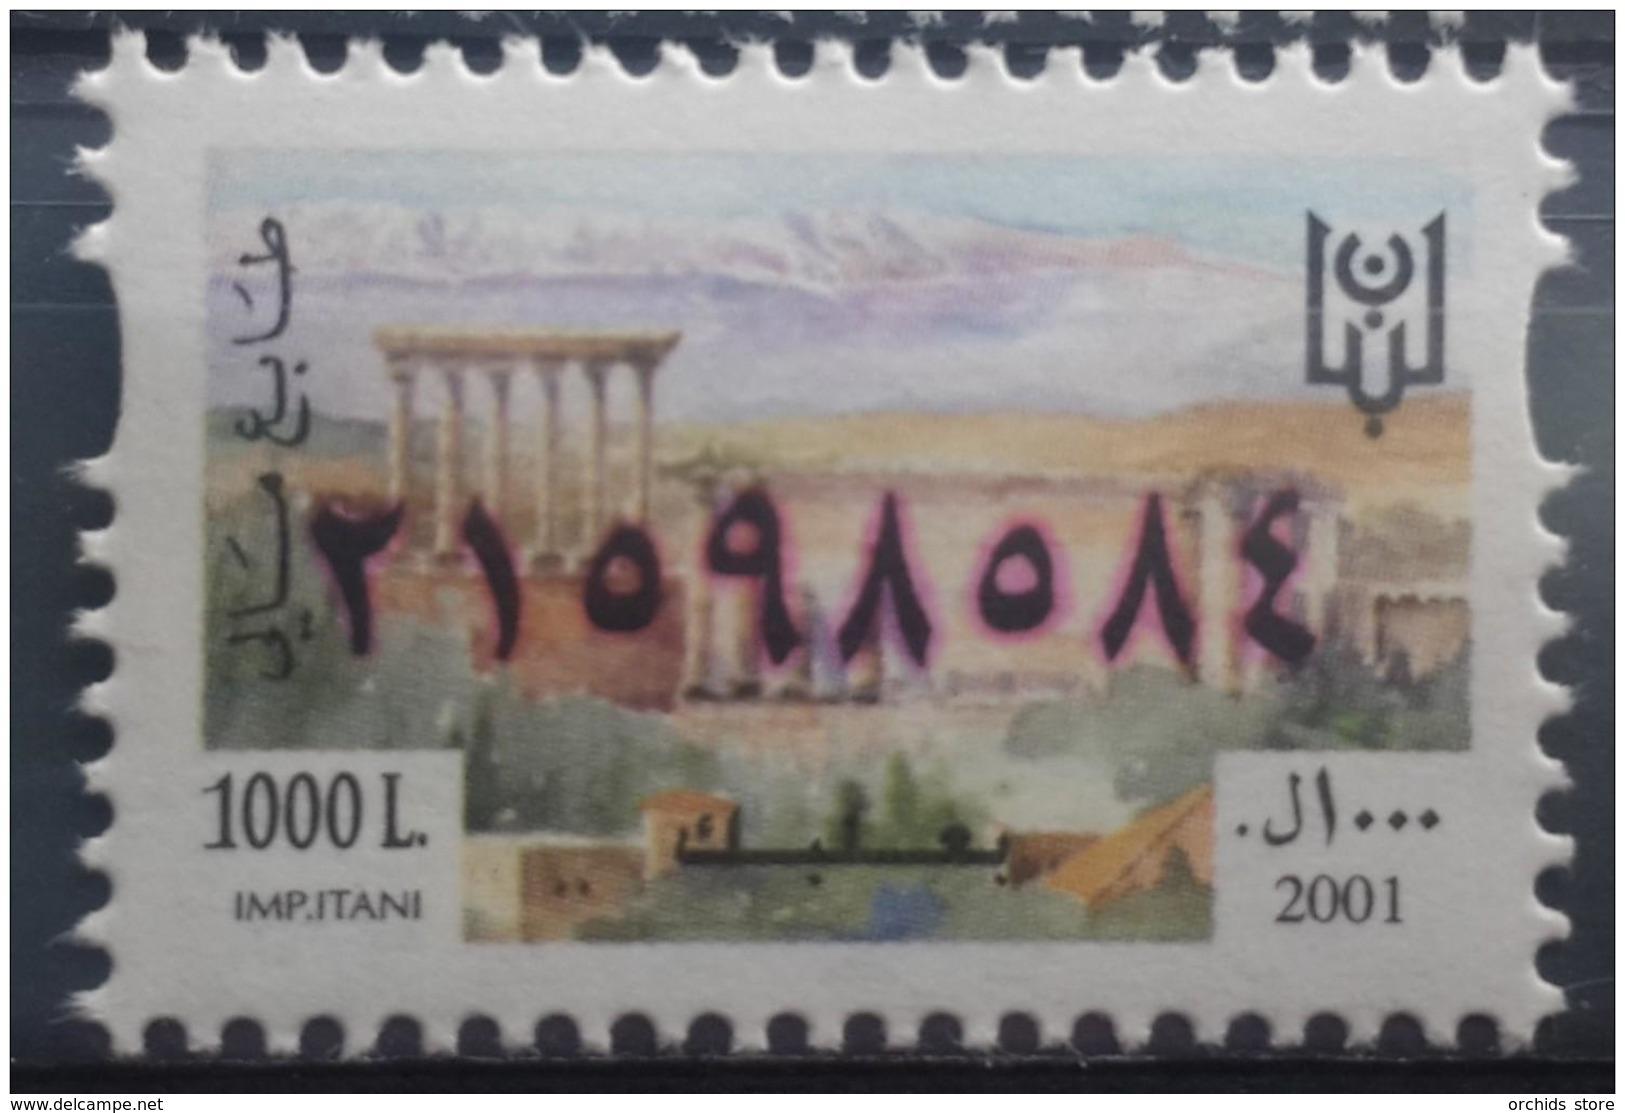 Lebanon 2001 Fiscal Revenue Stamp 1000 L - MNH - Baalbeck - Lebanon